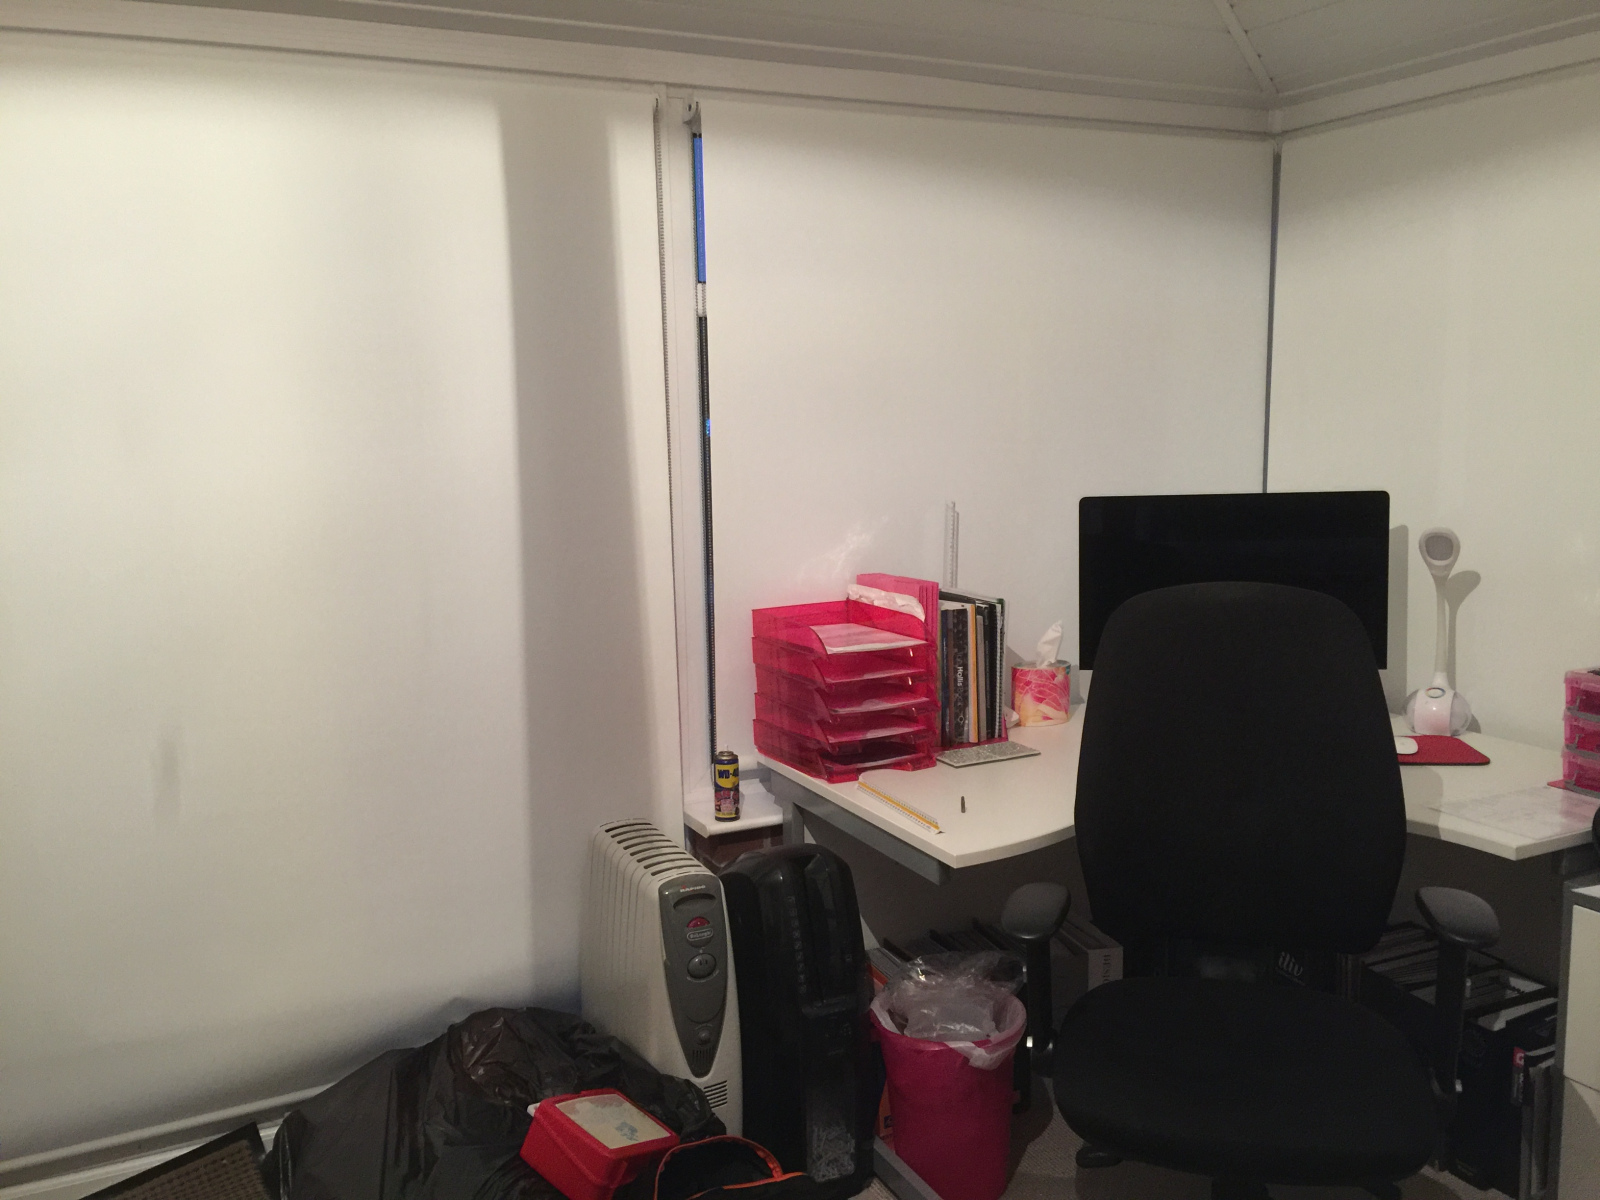 Office blinds at DJM